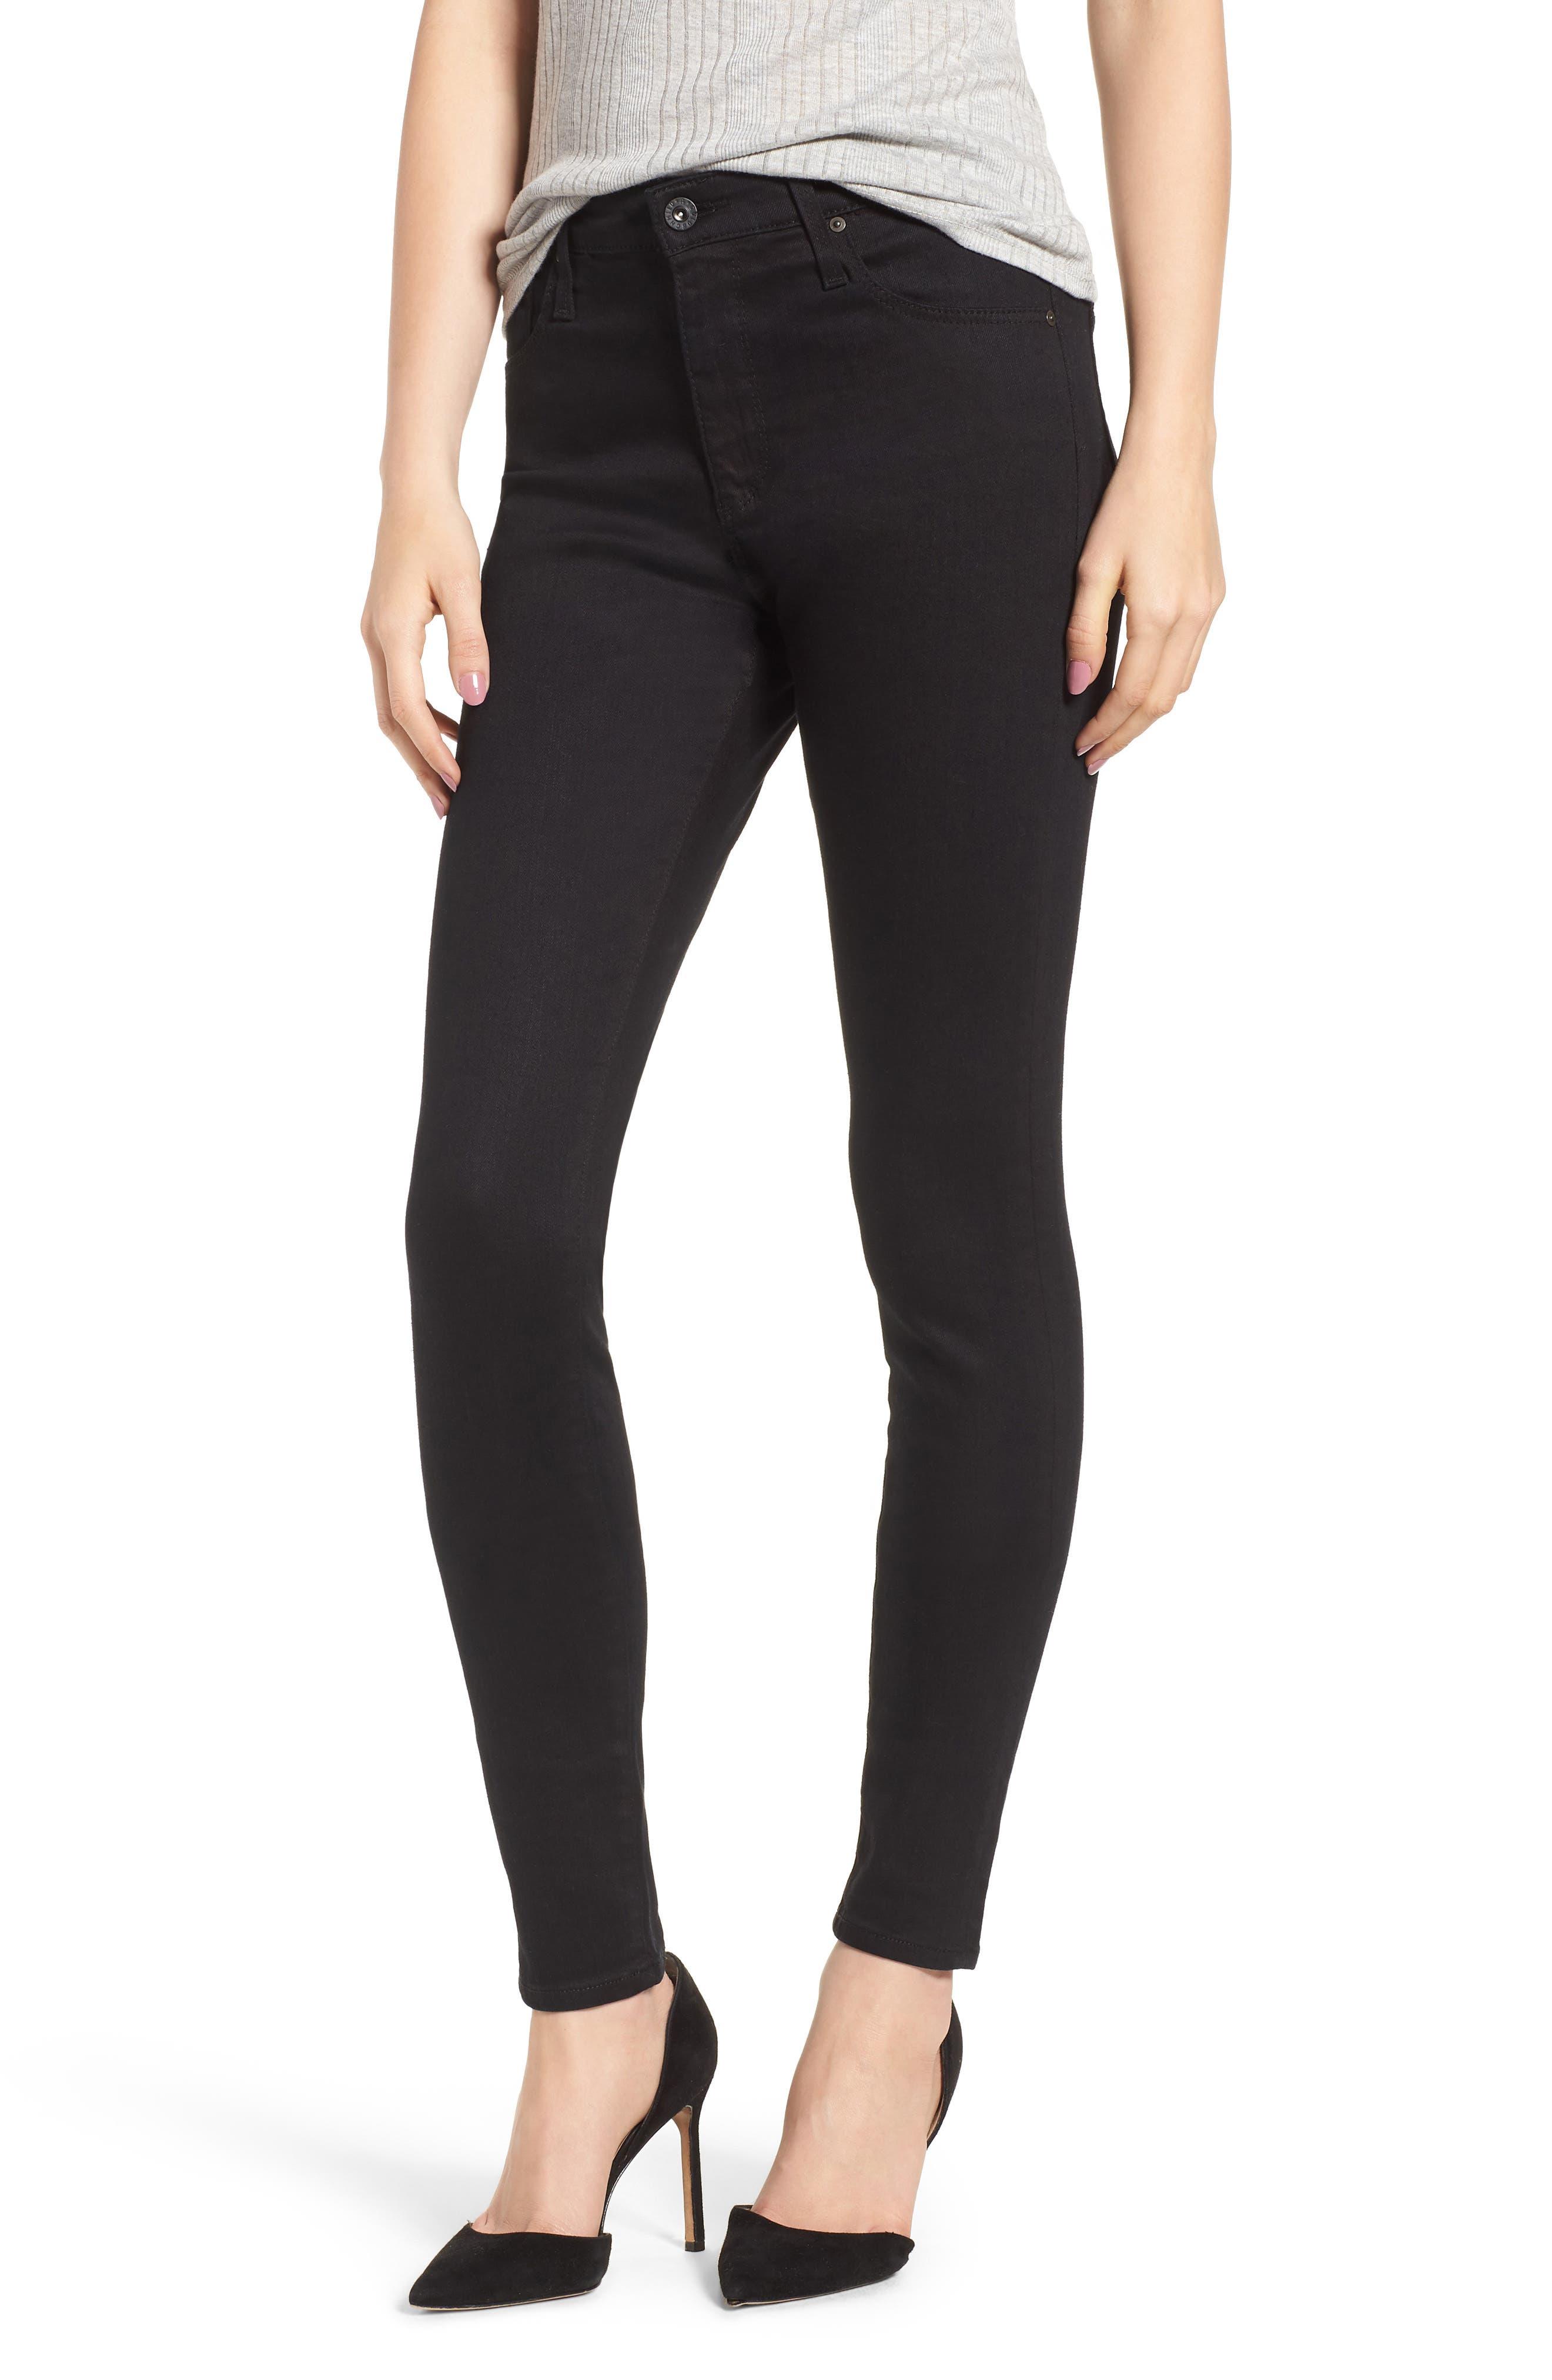 'The Farrah' High Rise Skinny Jeans,                             Main thumbnail 1, color,                             Overdyed Black